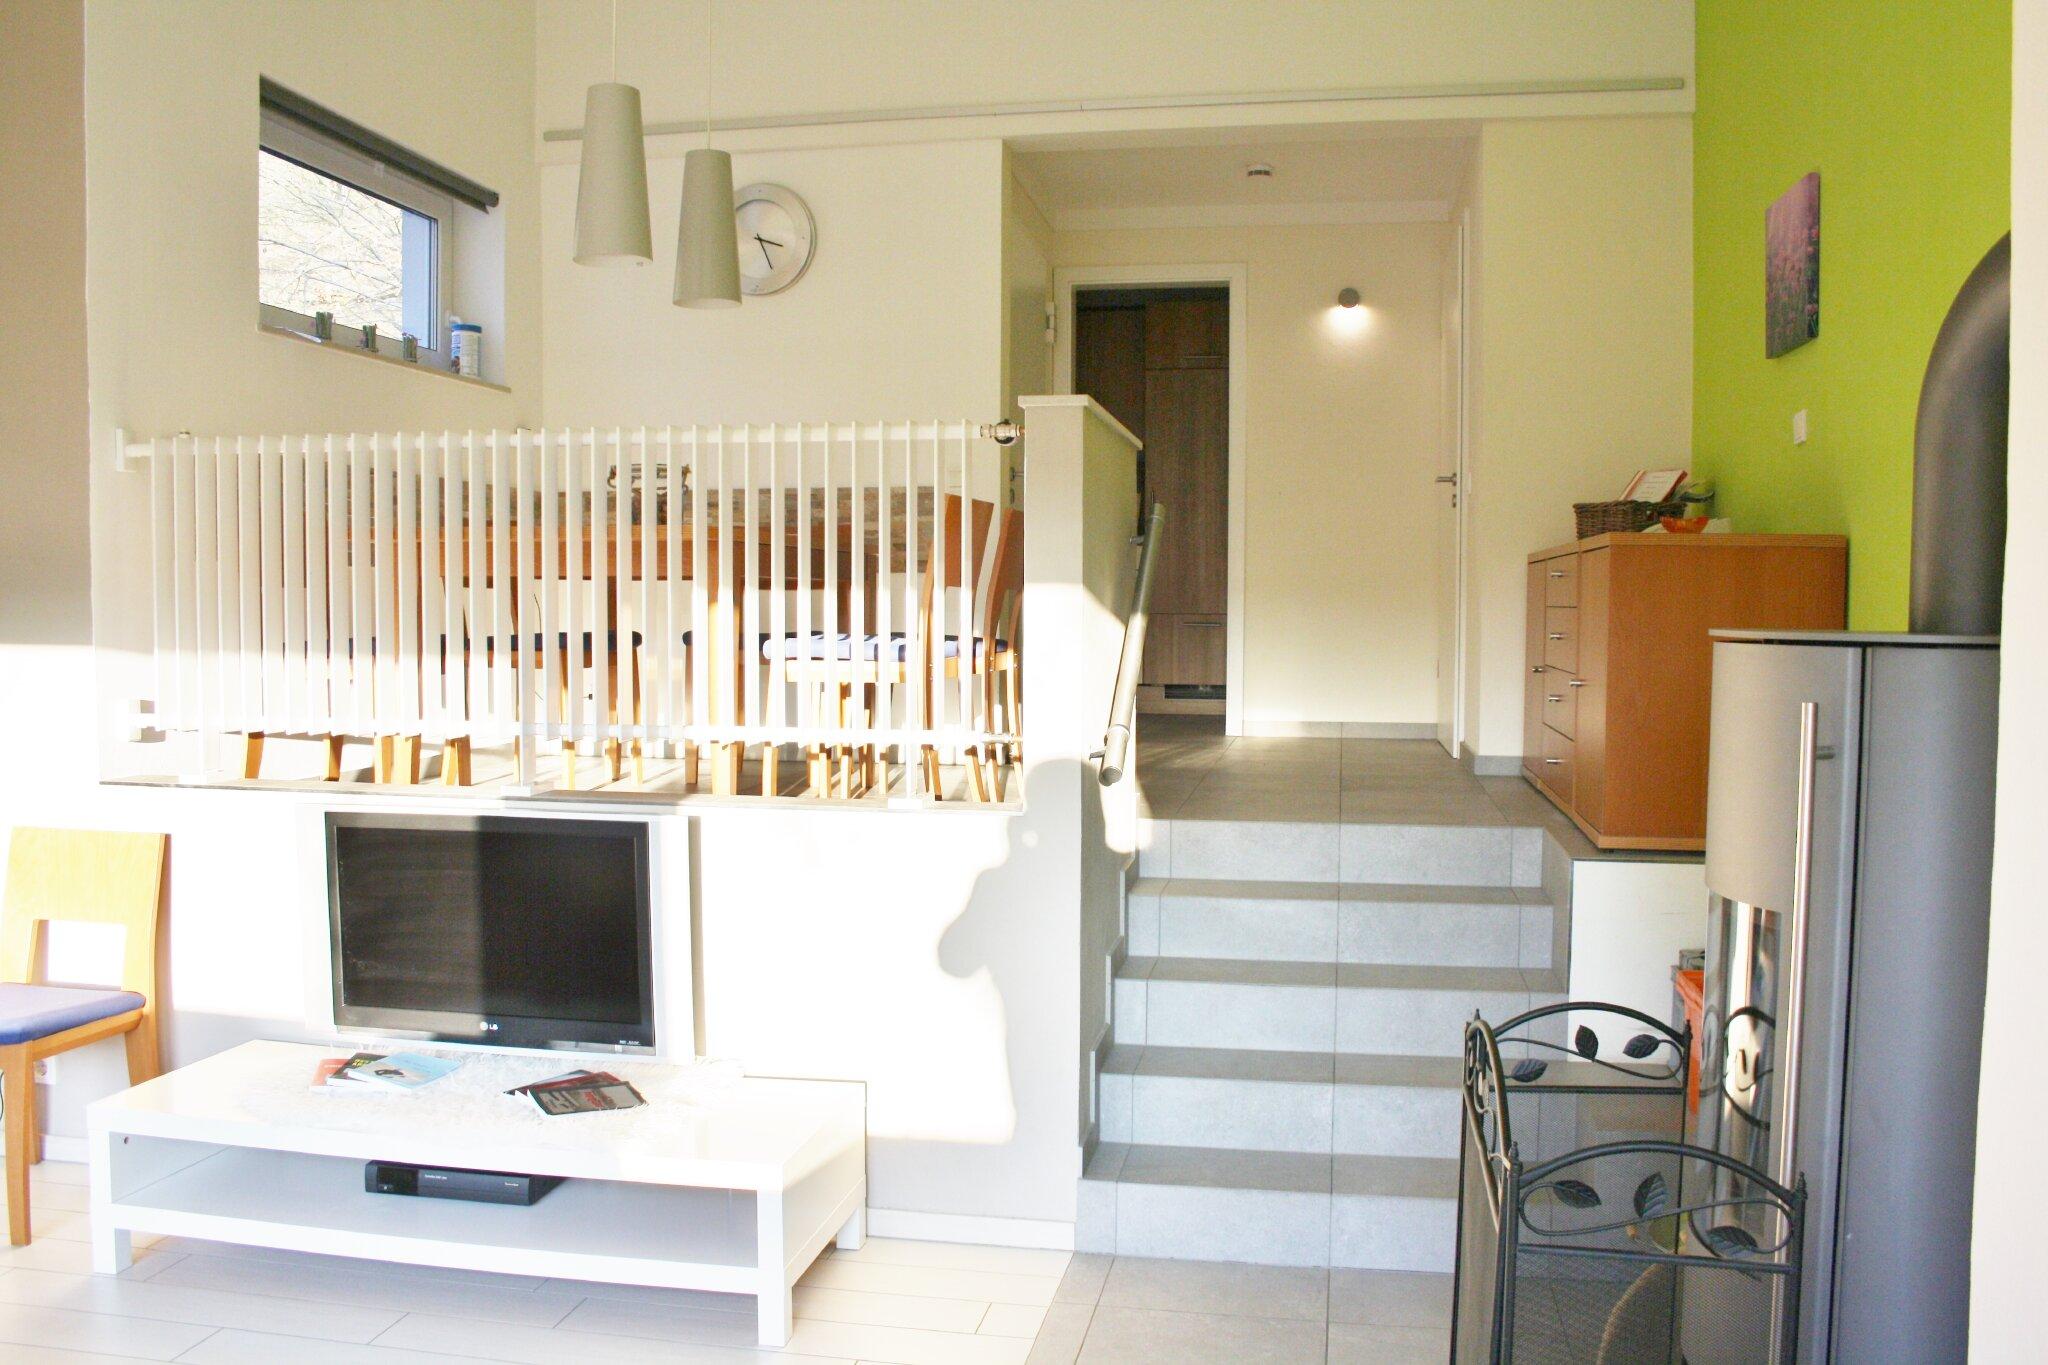 Grundriss Haus moderner Stil